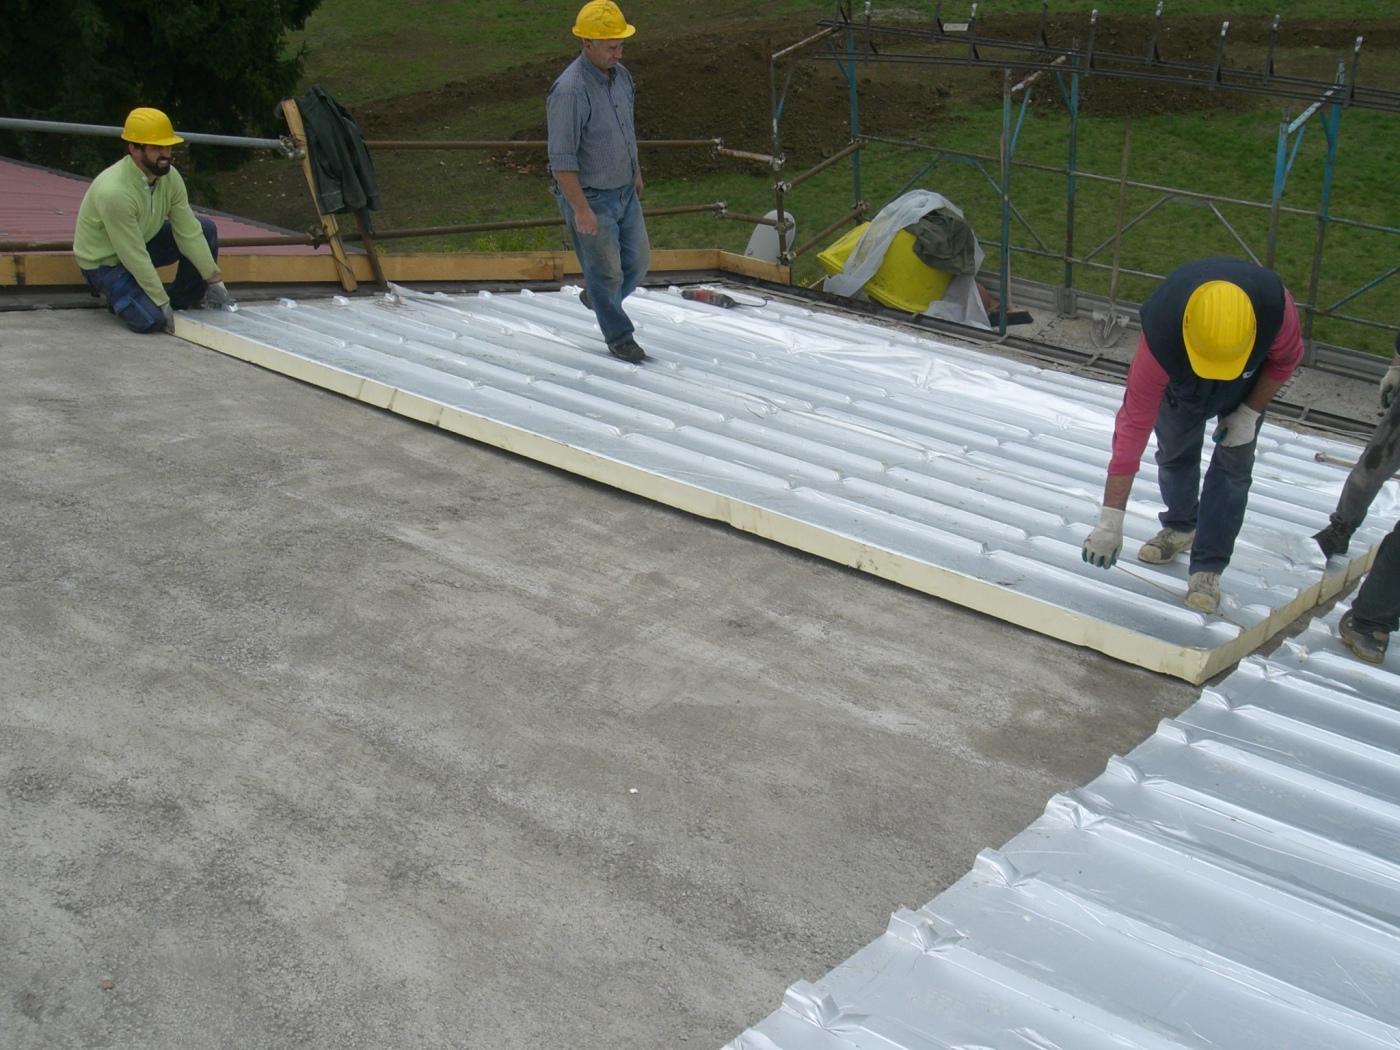 pannelli-isolanti-tetto-22